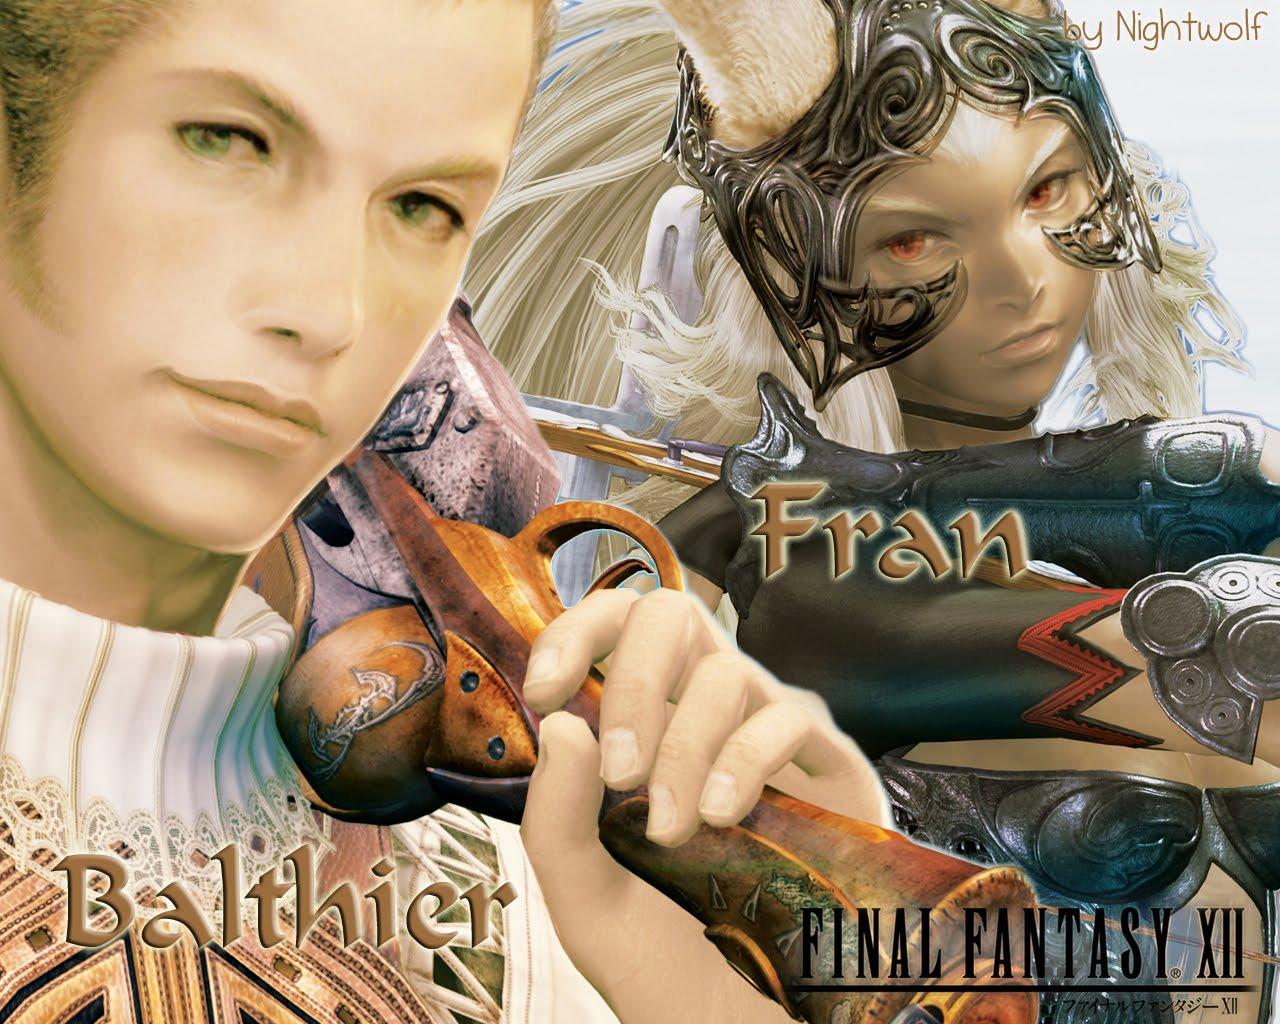 http://3.bp.blogspot.com/_pa5xsTTEa88/TI0FugUx8ZI/AAAAAAAAAHs/Lp0dC6ZCv3I/s1600/FFXII_Balthier_Fran_Wallpaper_by_Nightwulff%5B1%5D.jpg